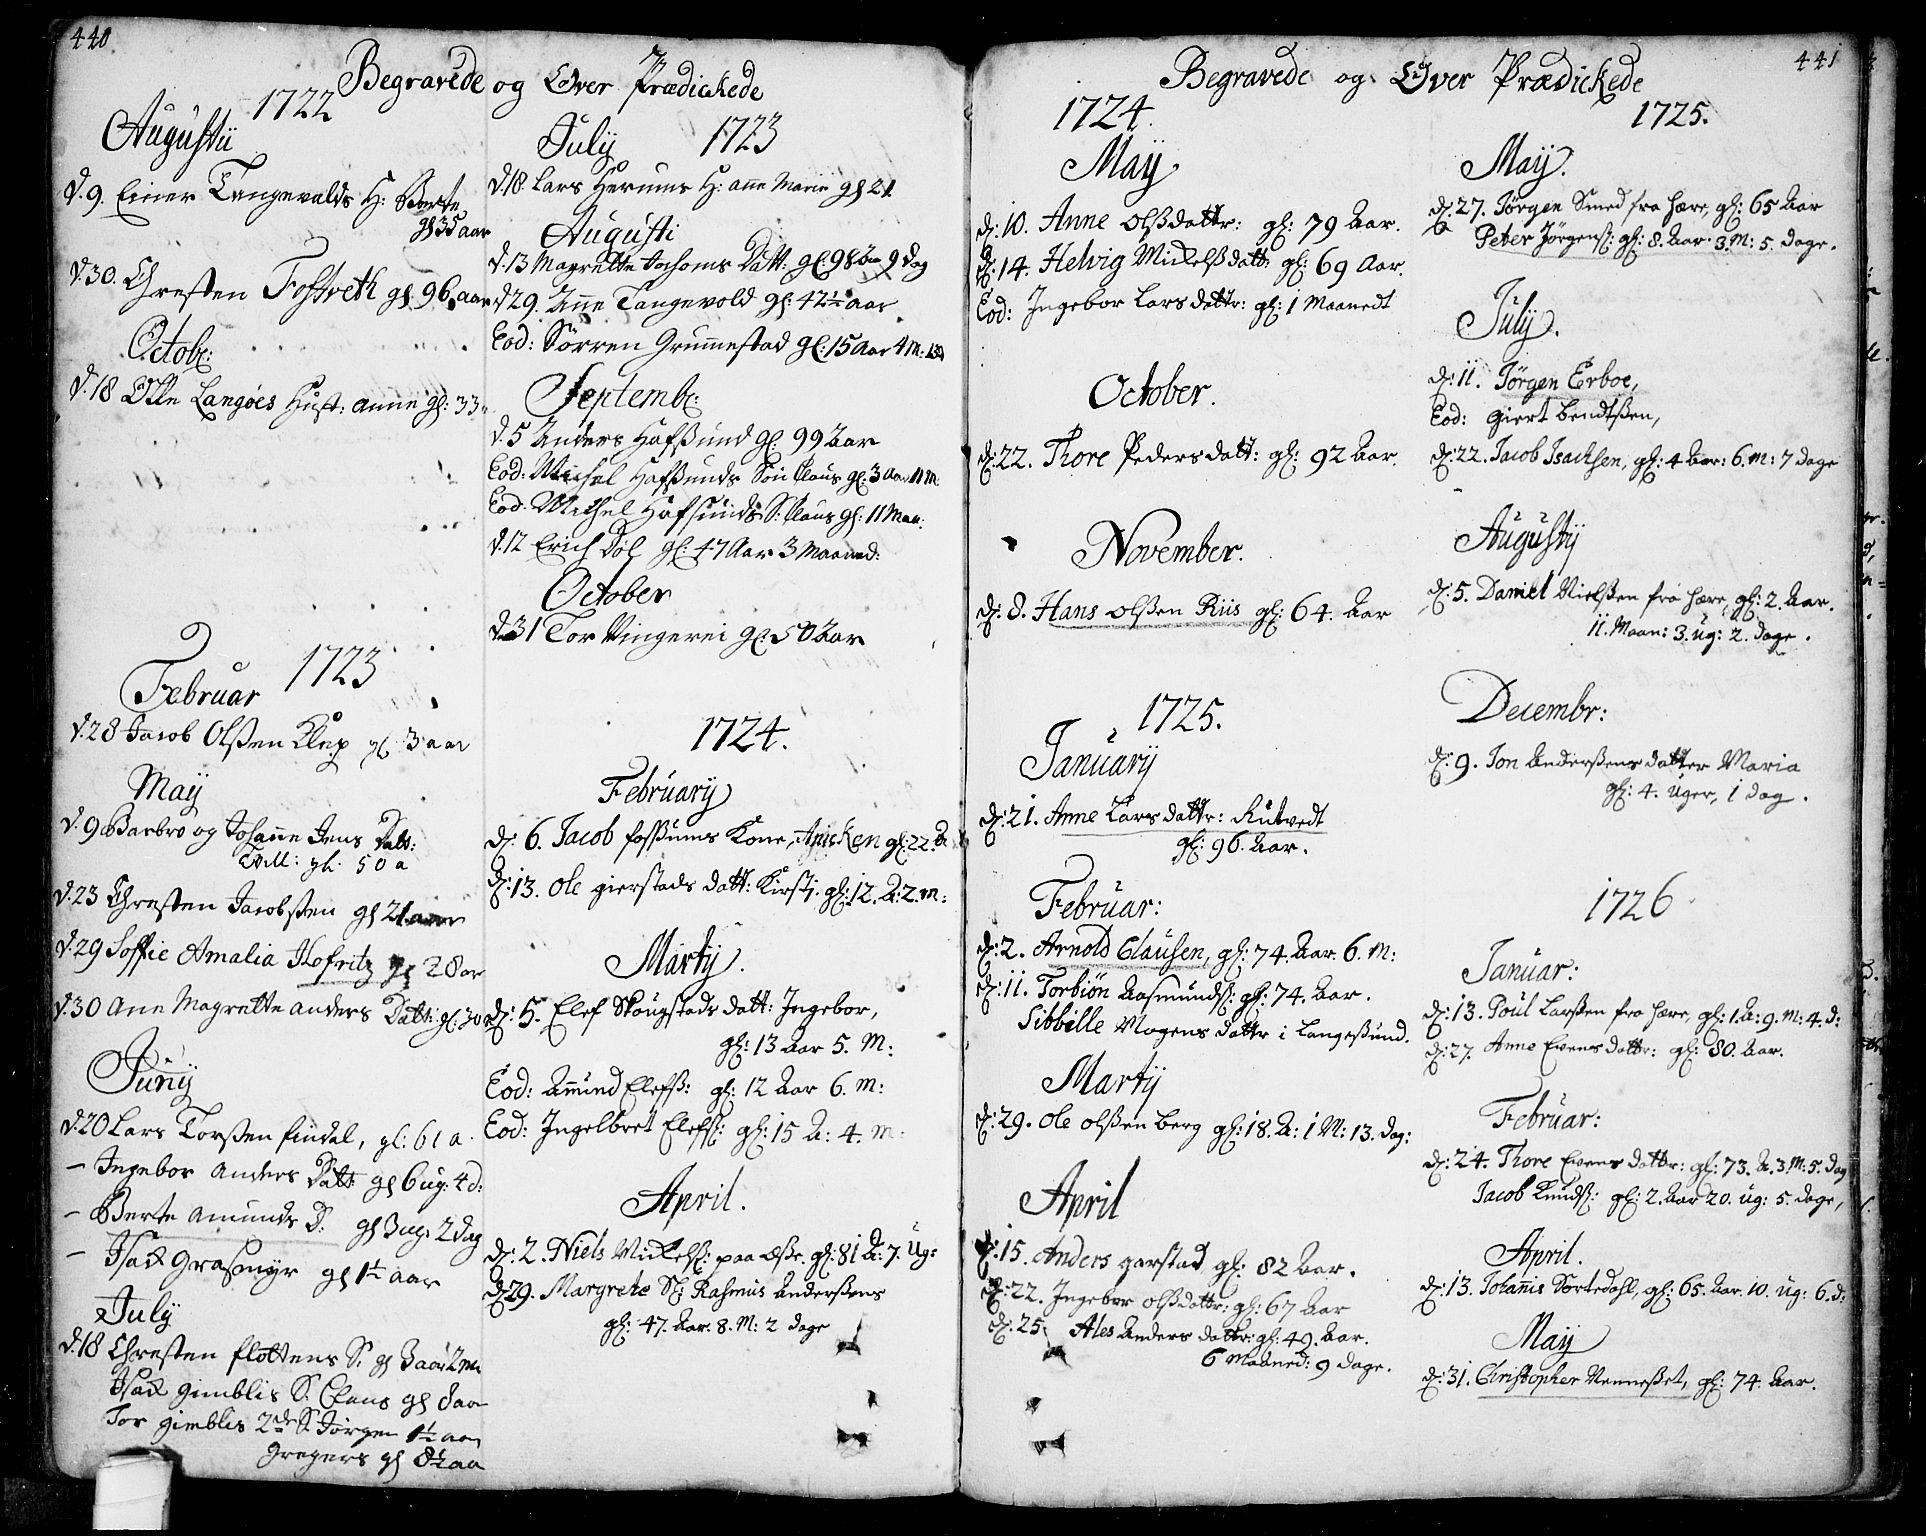 SAKO, Bamble kirkebøker, F/Fa/L0001: Ministerialbok nr. I 1, 1702-1774, s. 440-441